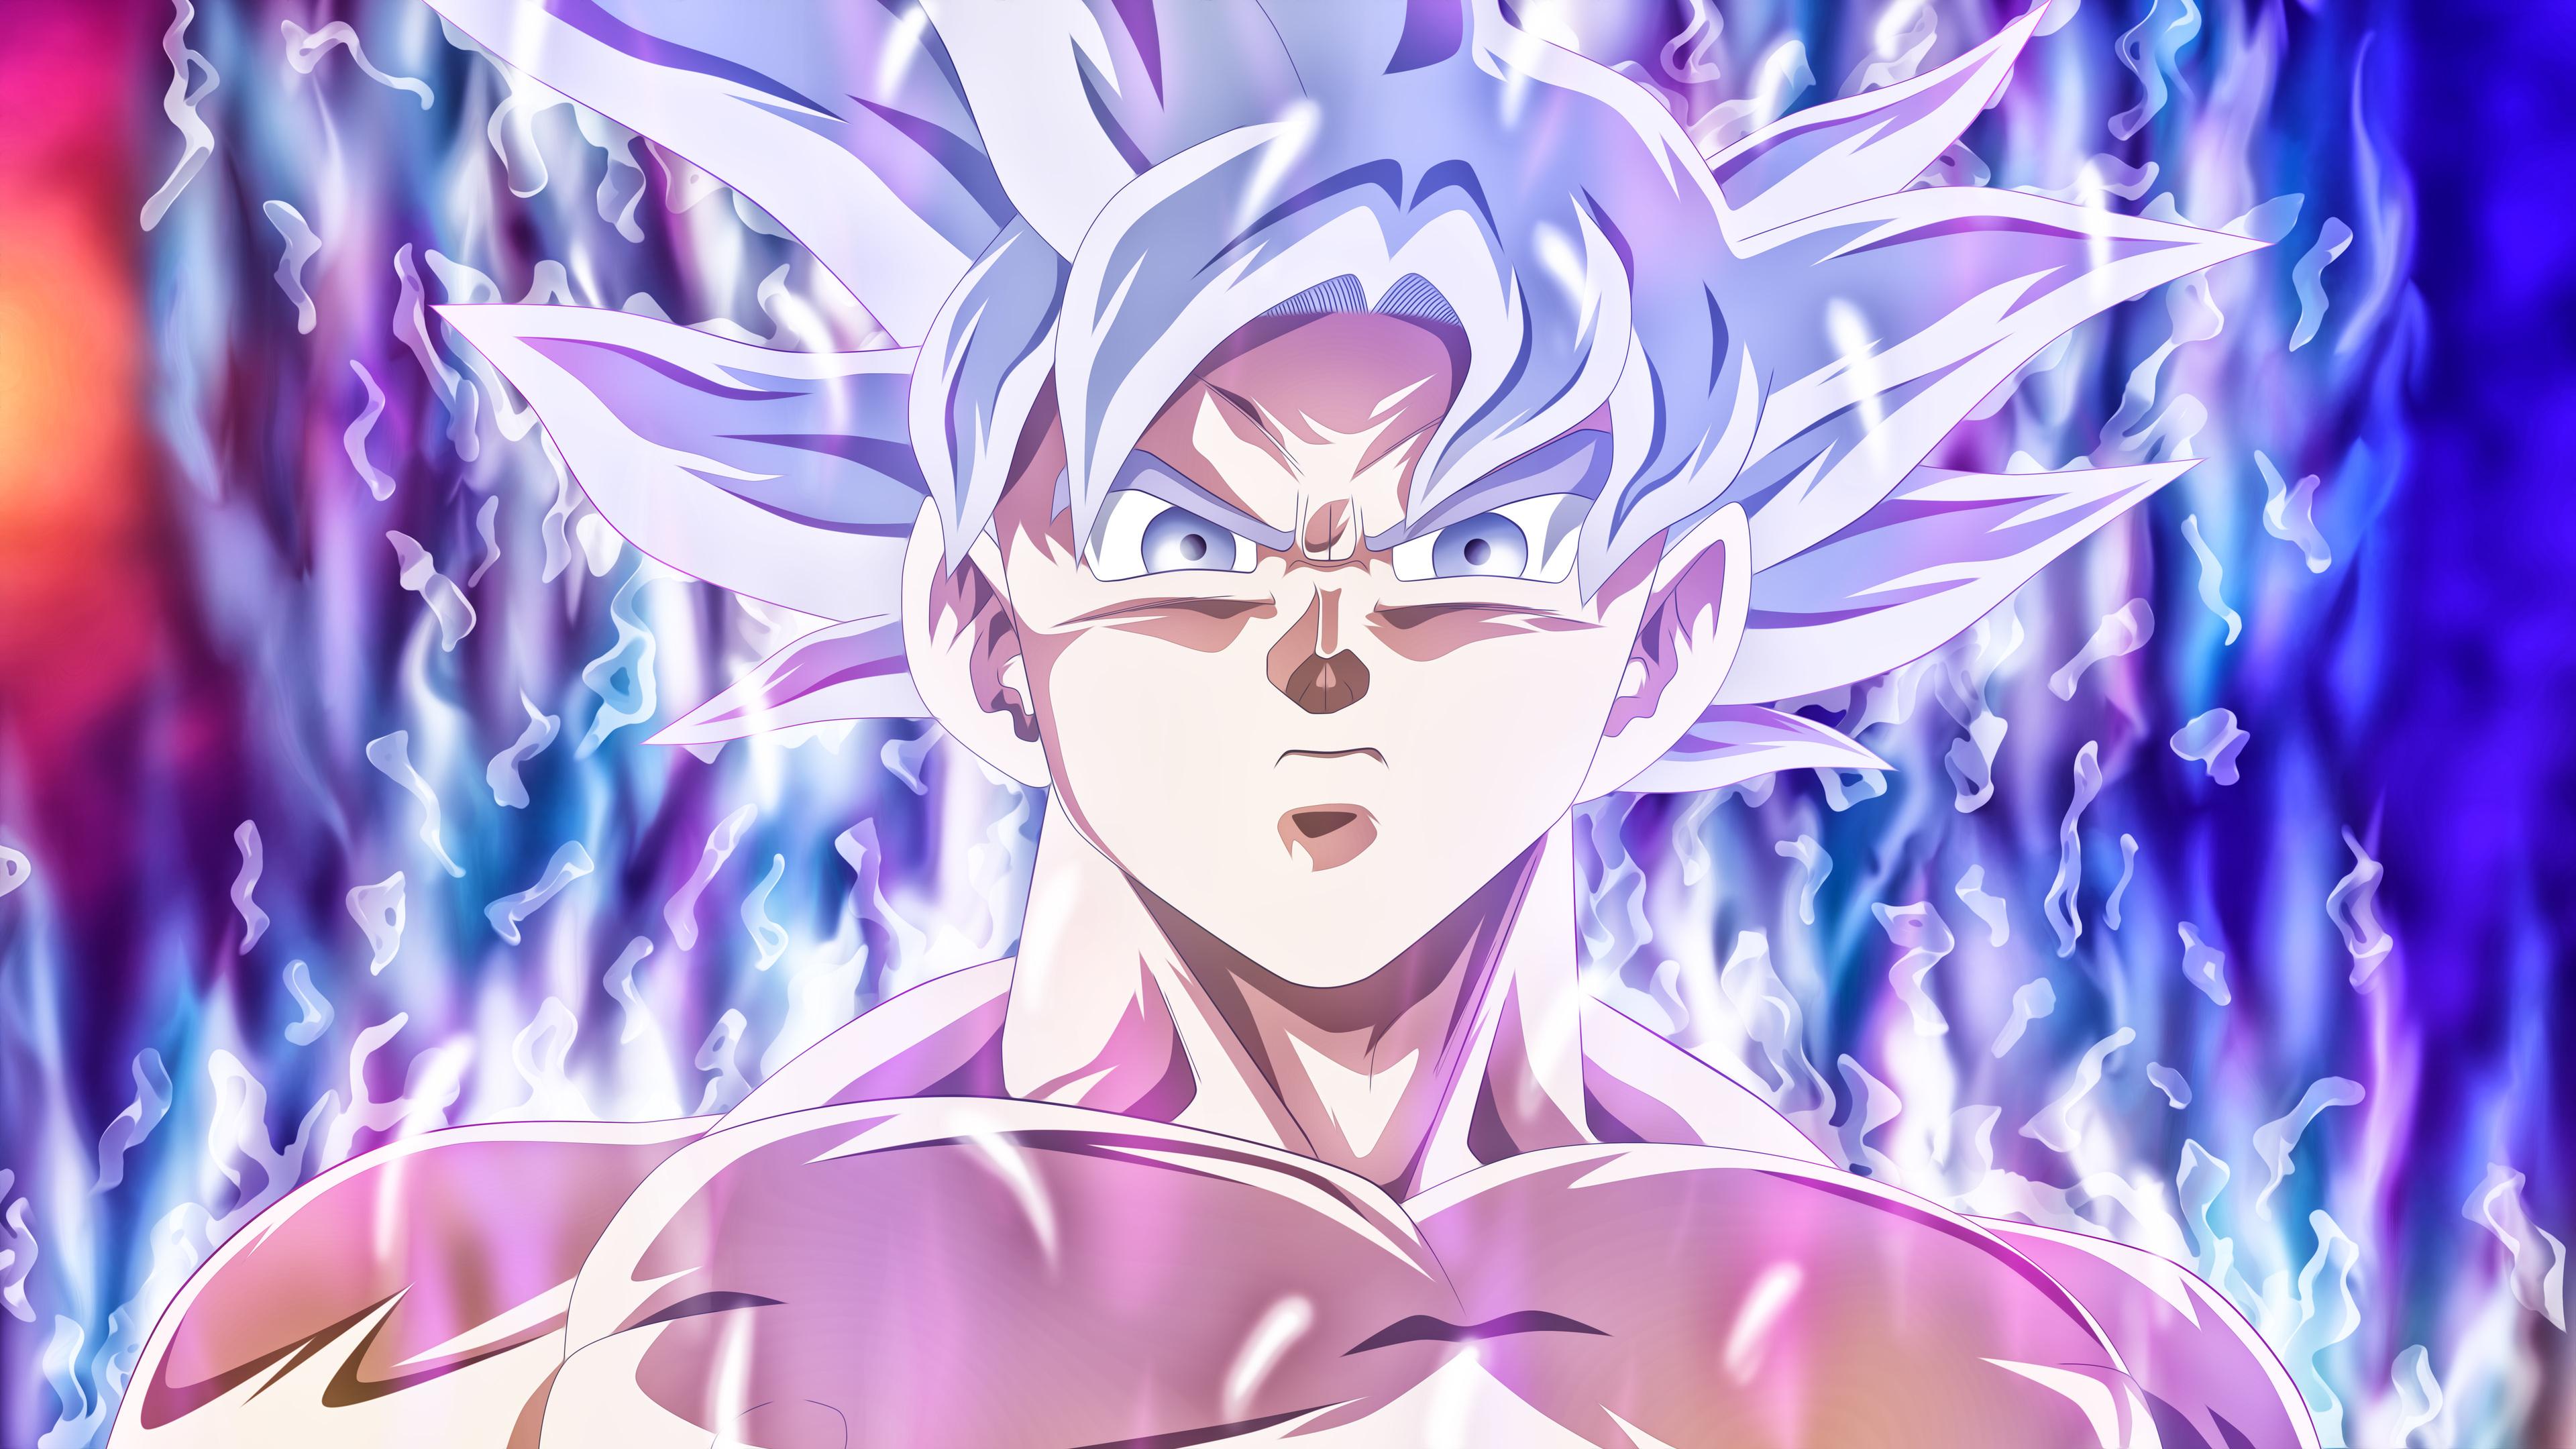 goku mastered ultra instinct 1541974387 - Goku Mastered Ultra Instinct - hd-wallpapers, goku wallpapers, dragon ball wallpapers, dragon ball super wallpapers, deviantart wallpapers, artist wallpapers, anime wallpapers, 4k-wallpapers